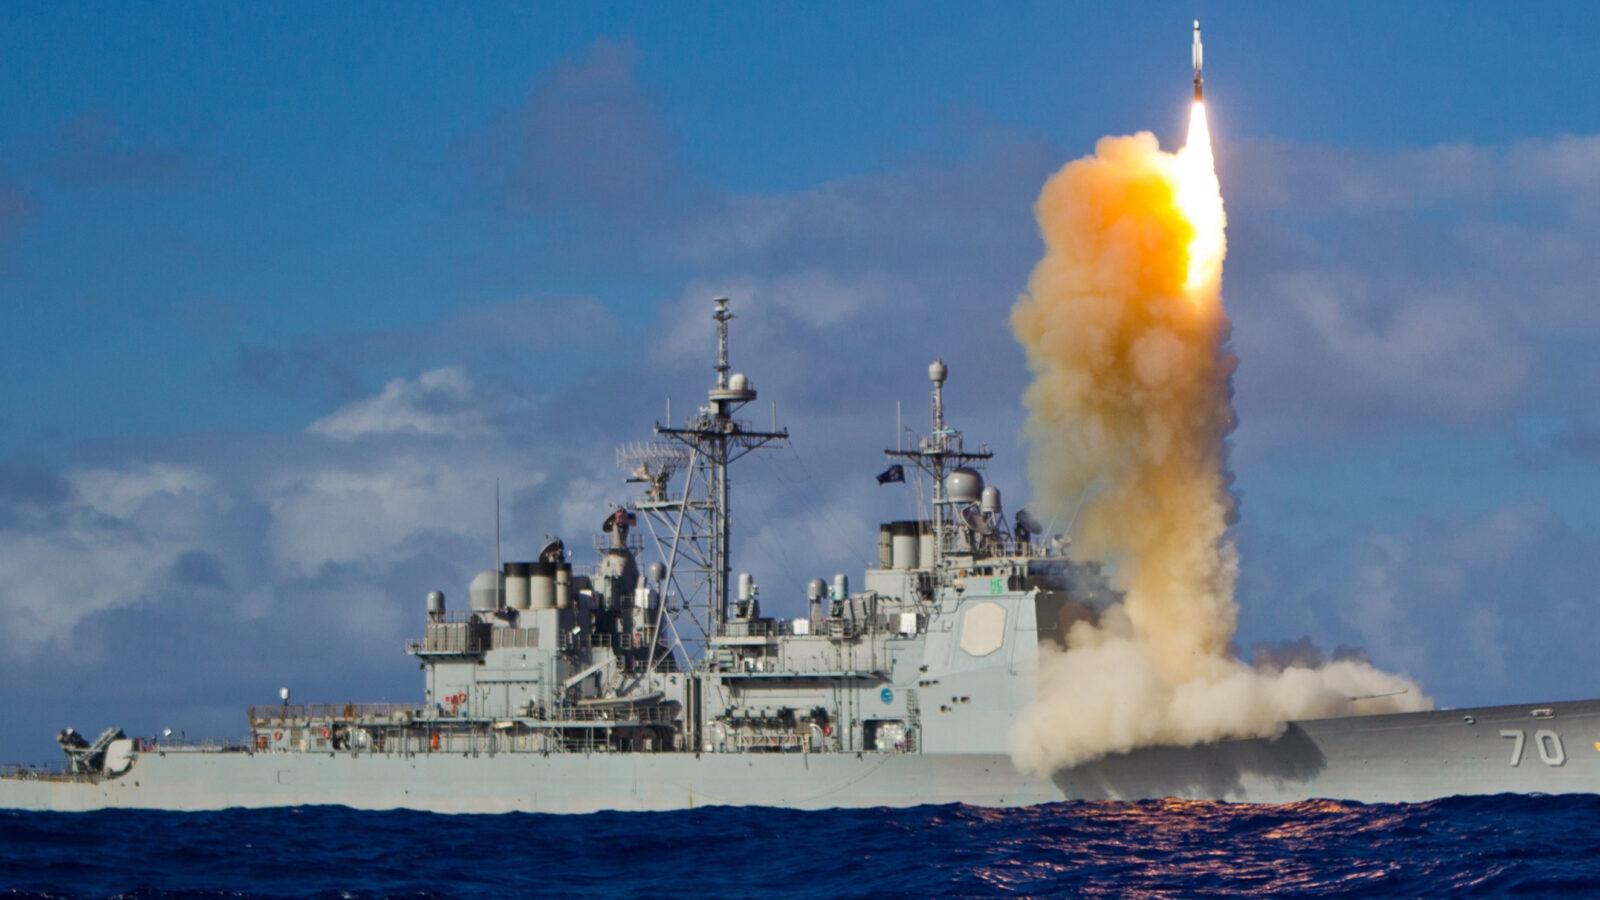 Aegis cruiser firing missiles